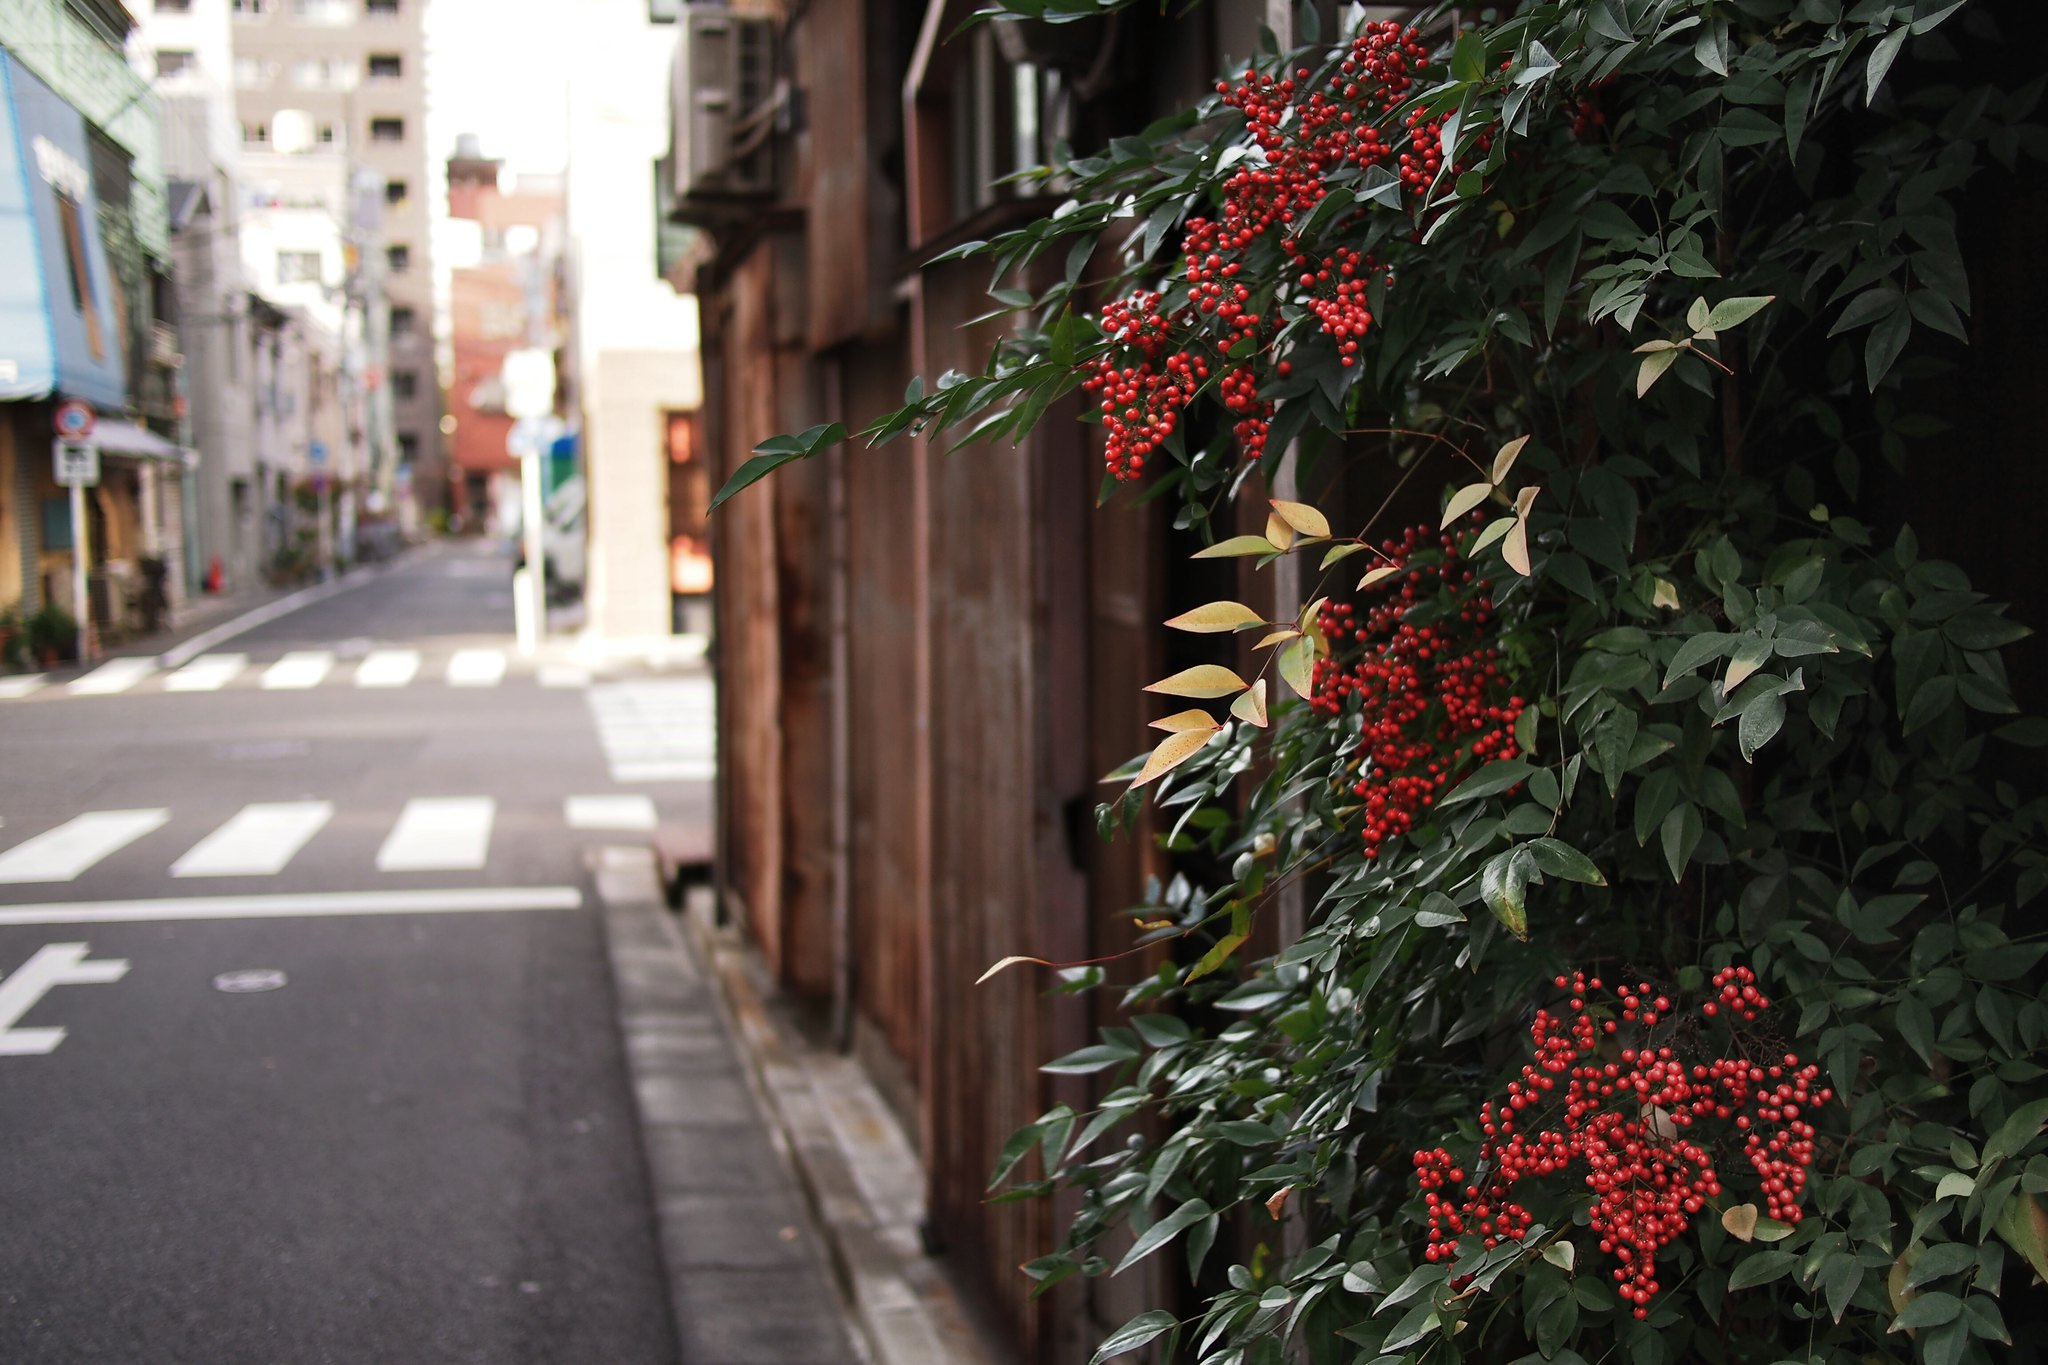 06102019_galeria-tsukiji hiace555.jpg